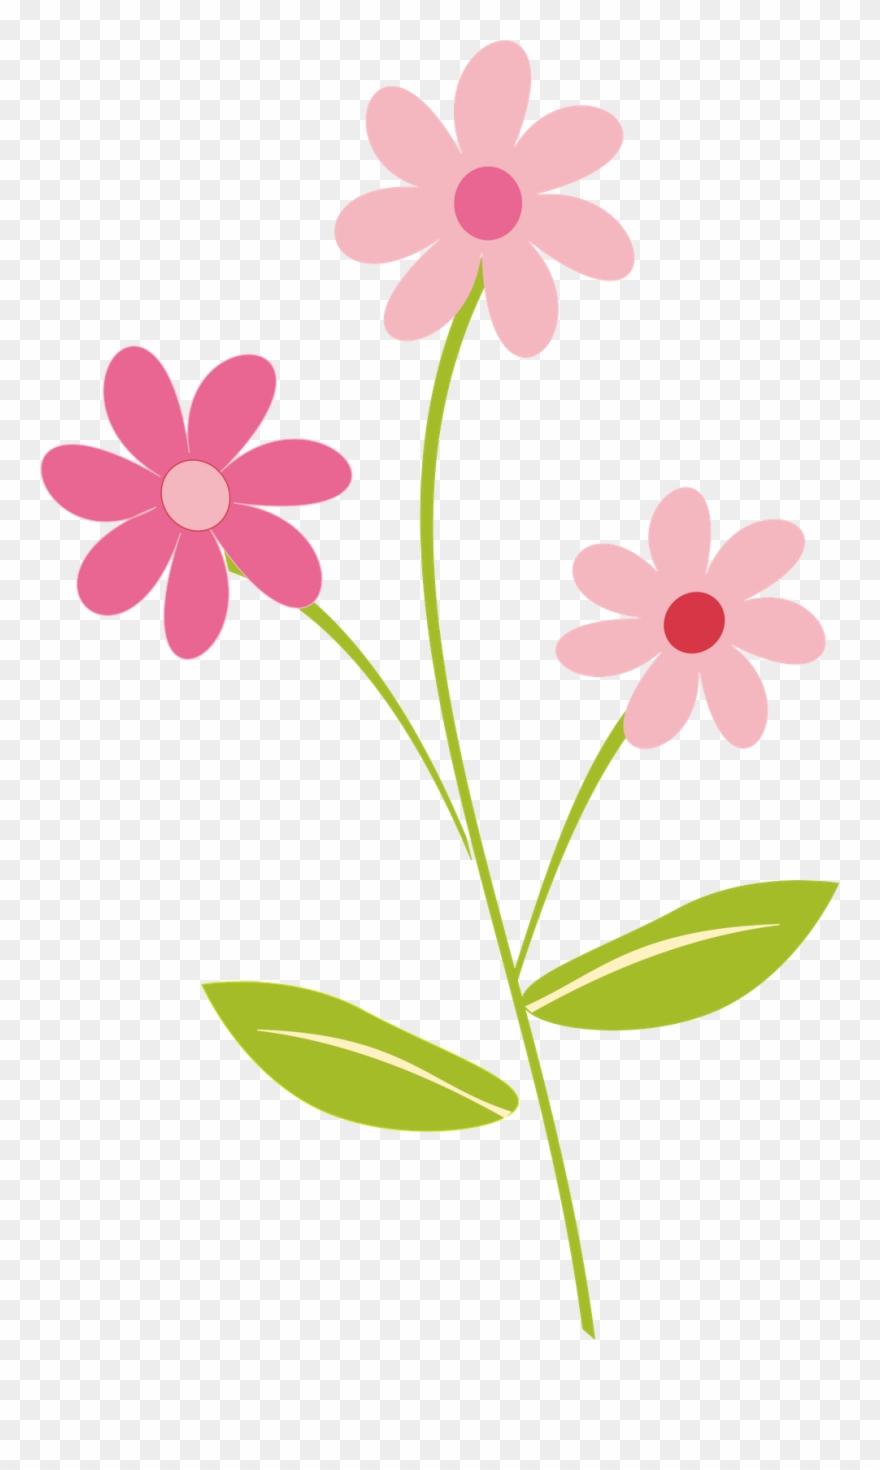 medium resolution of flowers border clipart png clipart flower border png transparent png